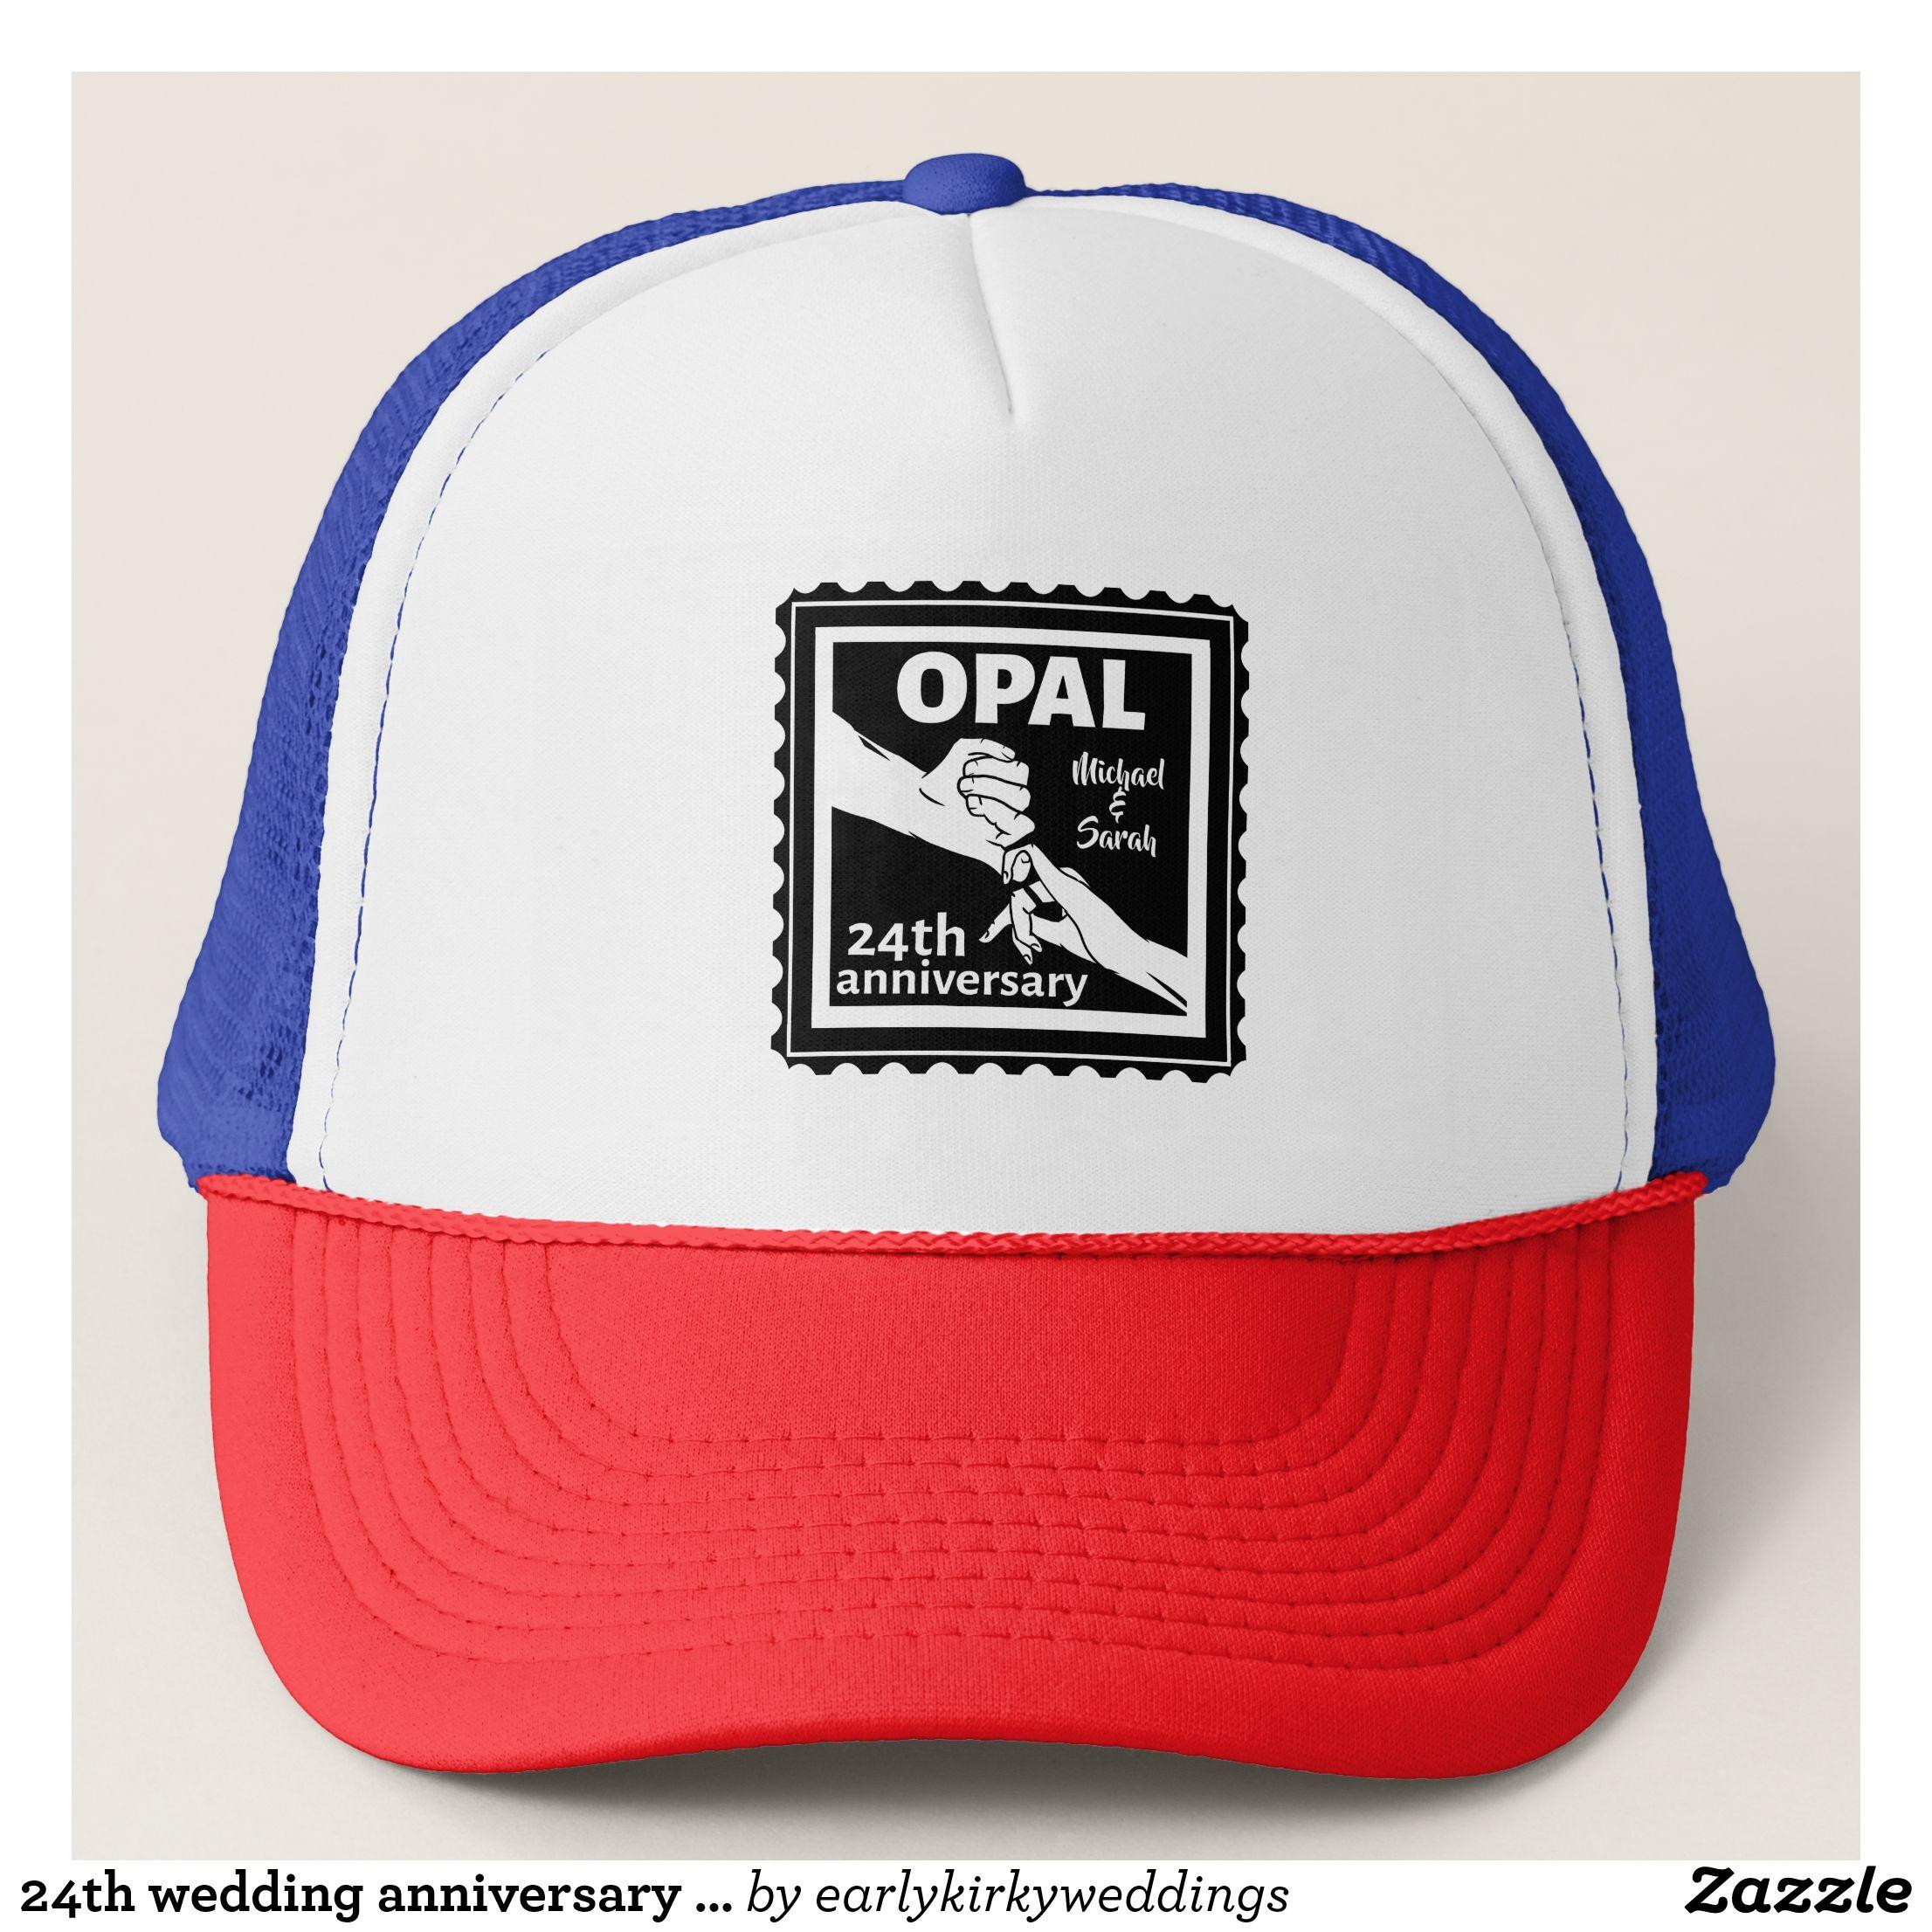 24th wedding anniversary traditional opal trucker hat